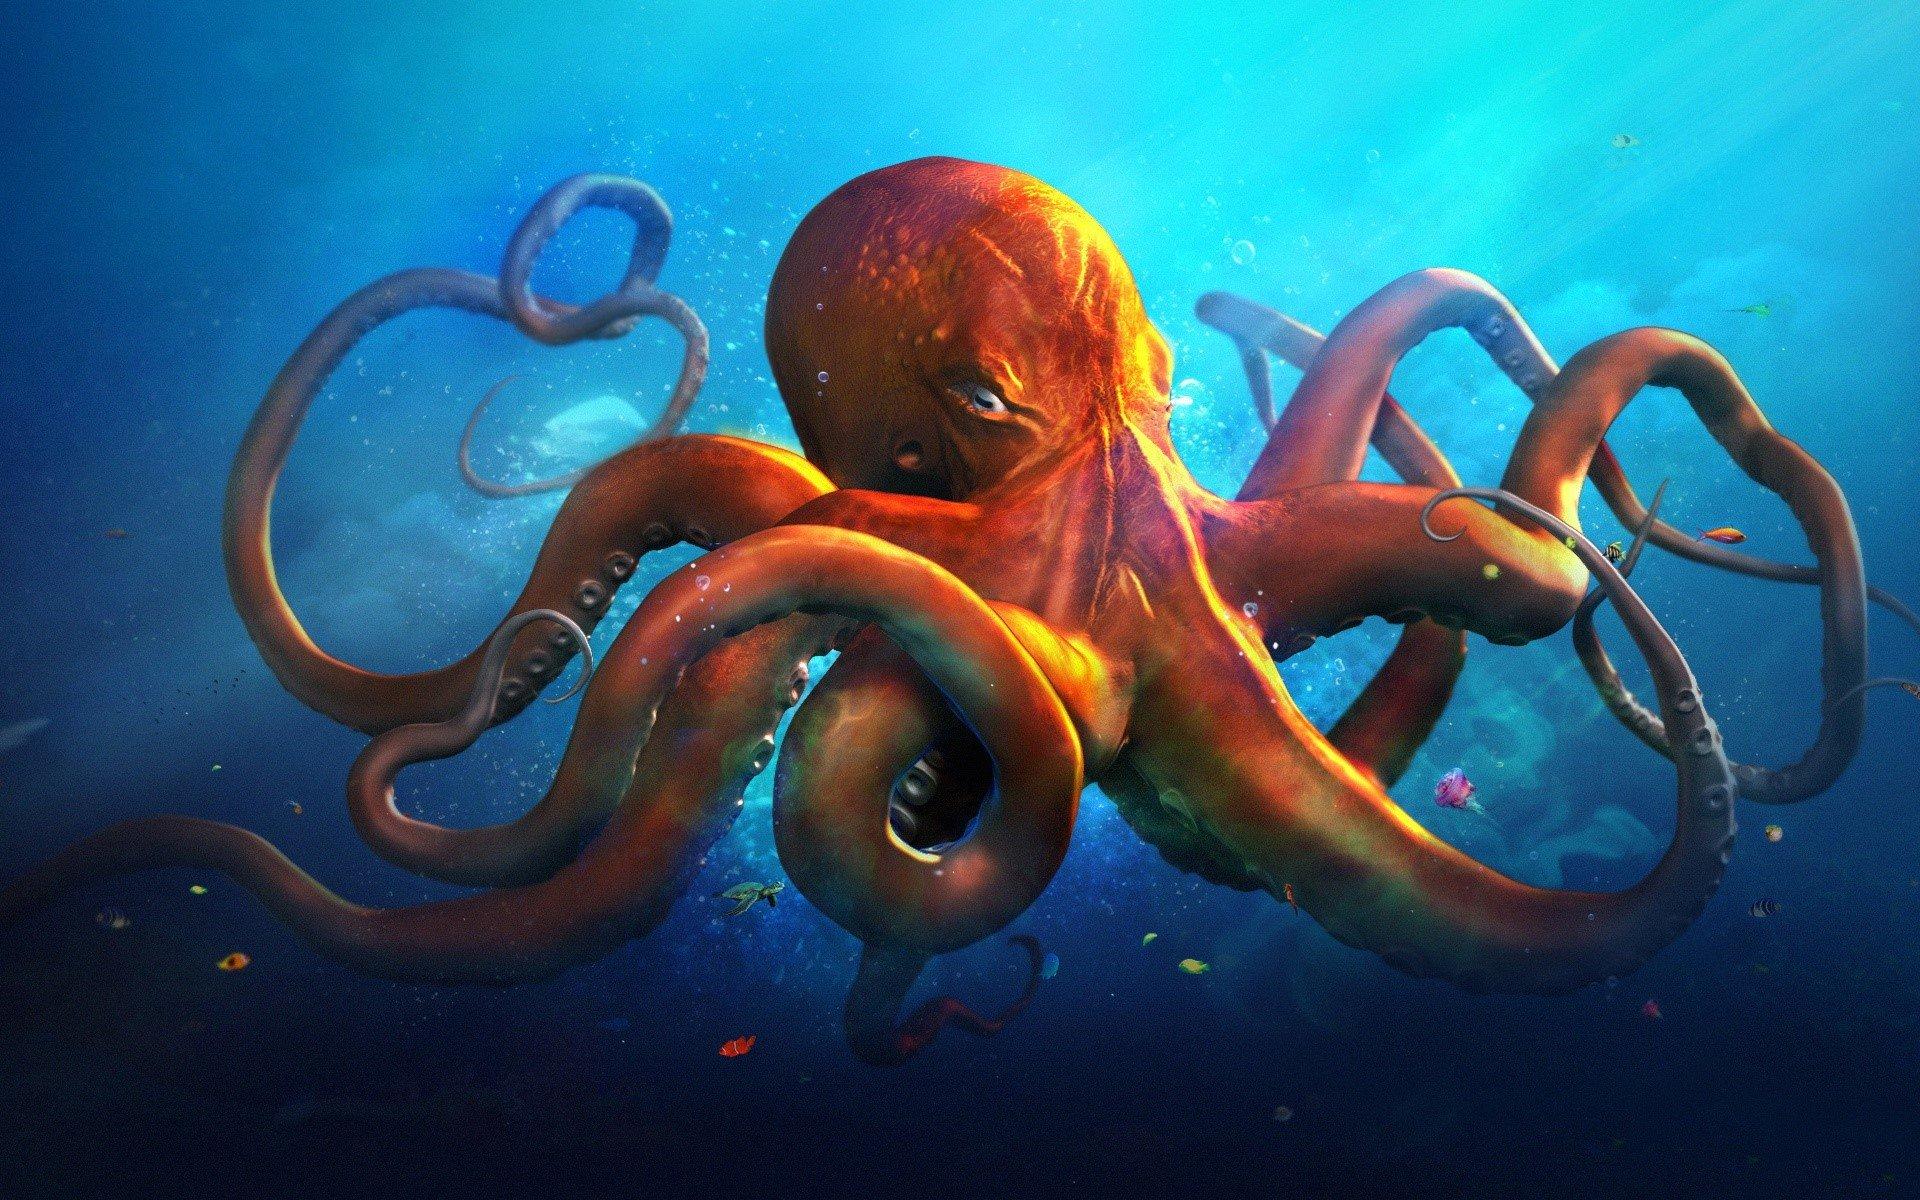 Fondos de pantalla Slouching octopus